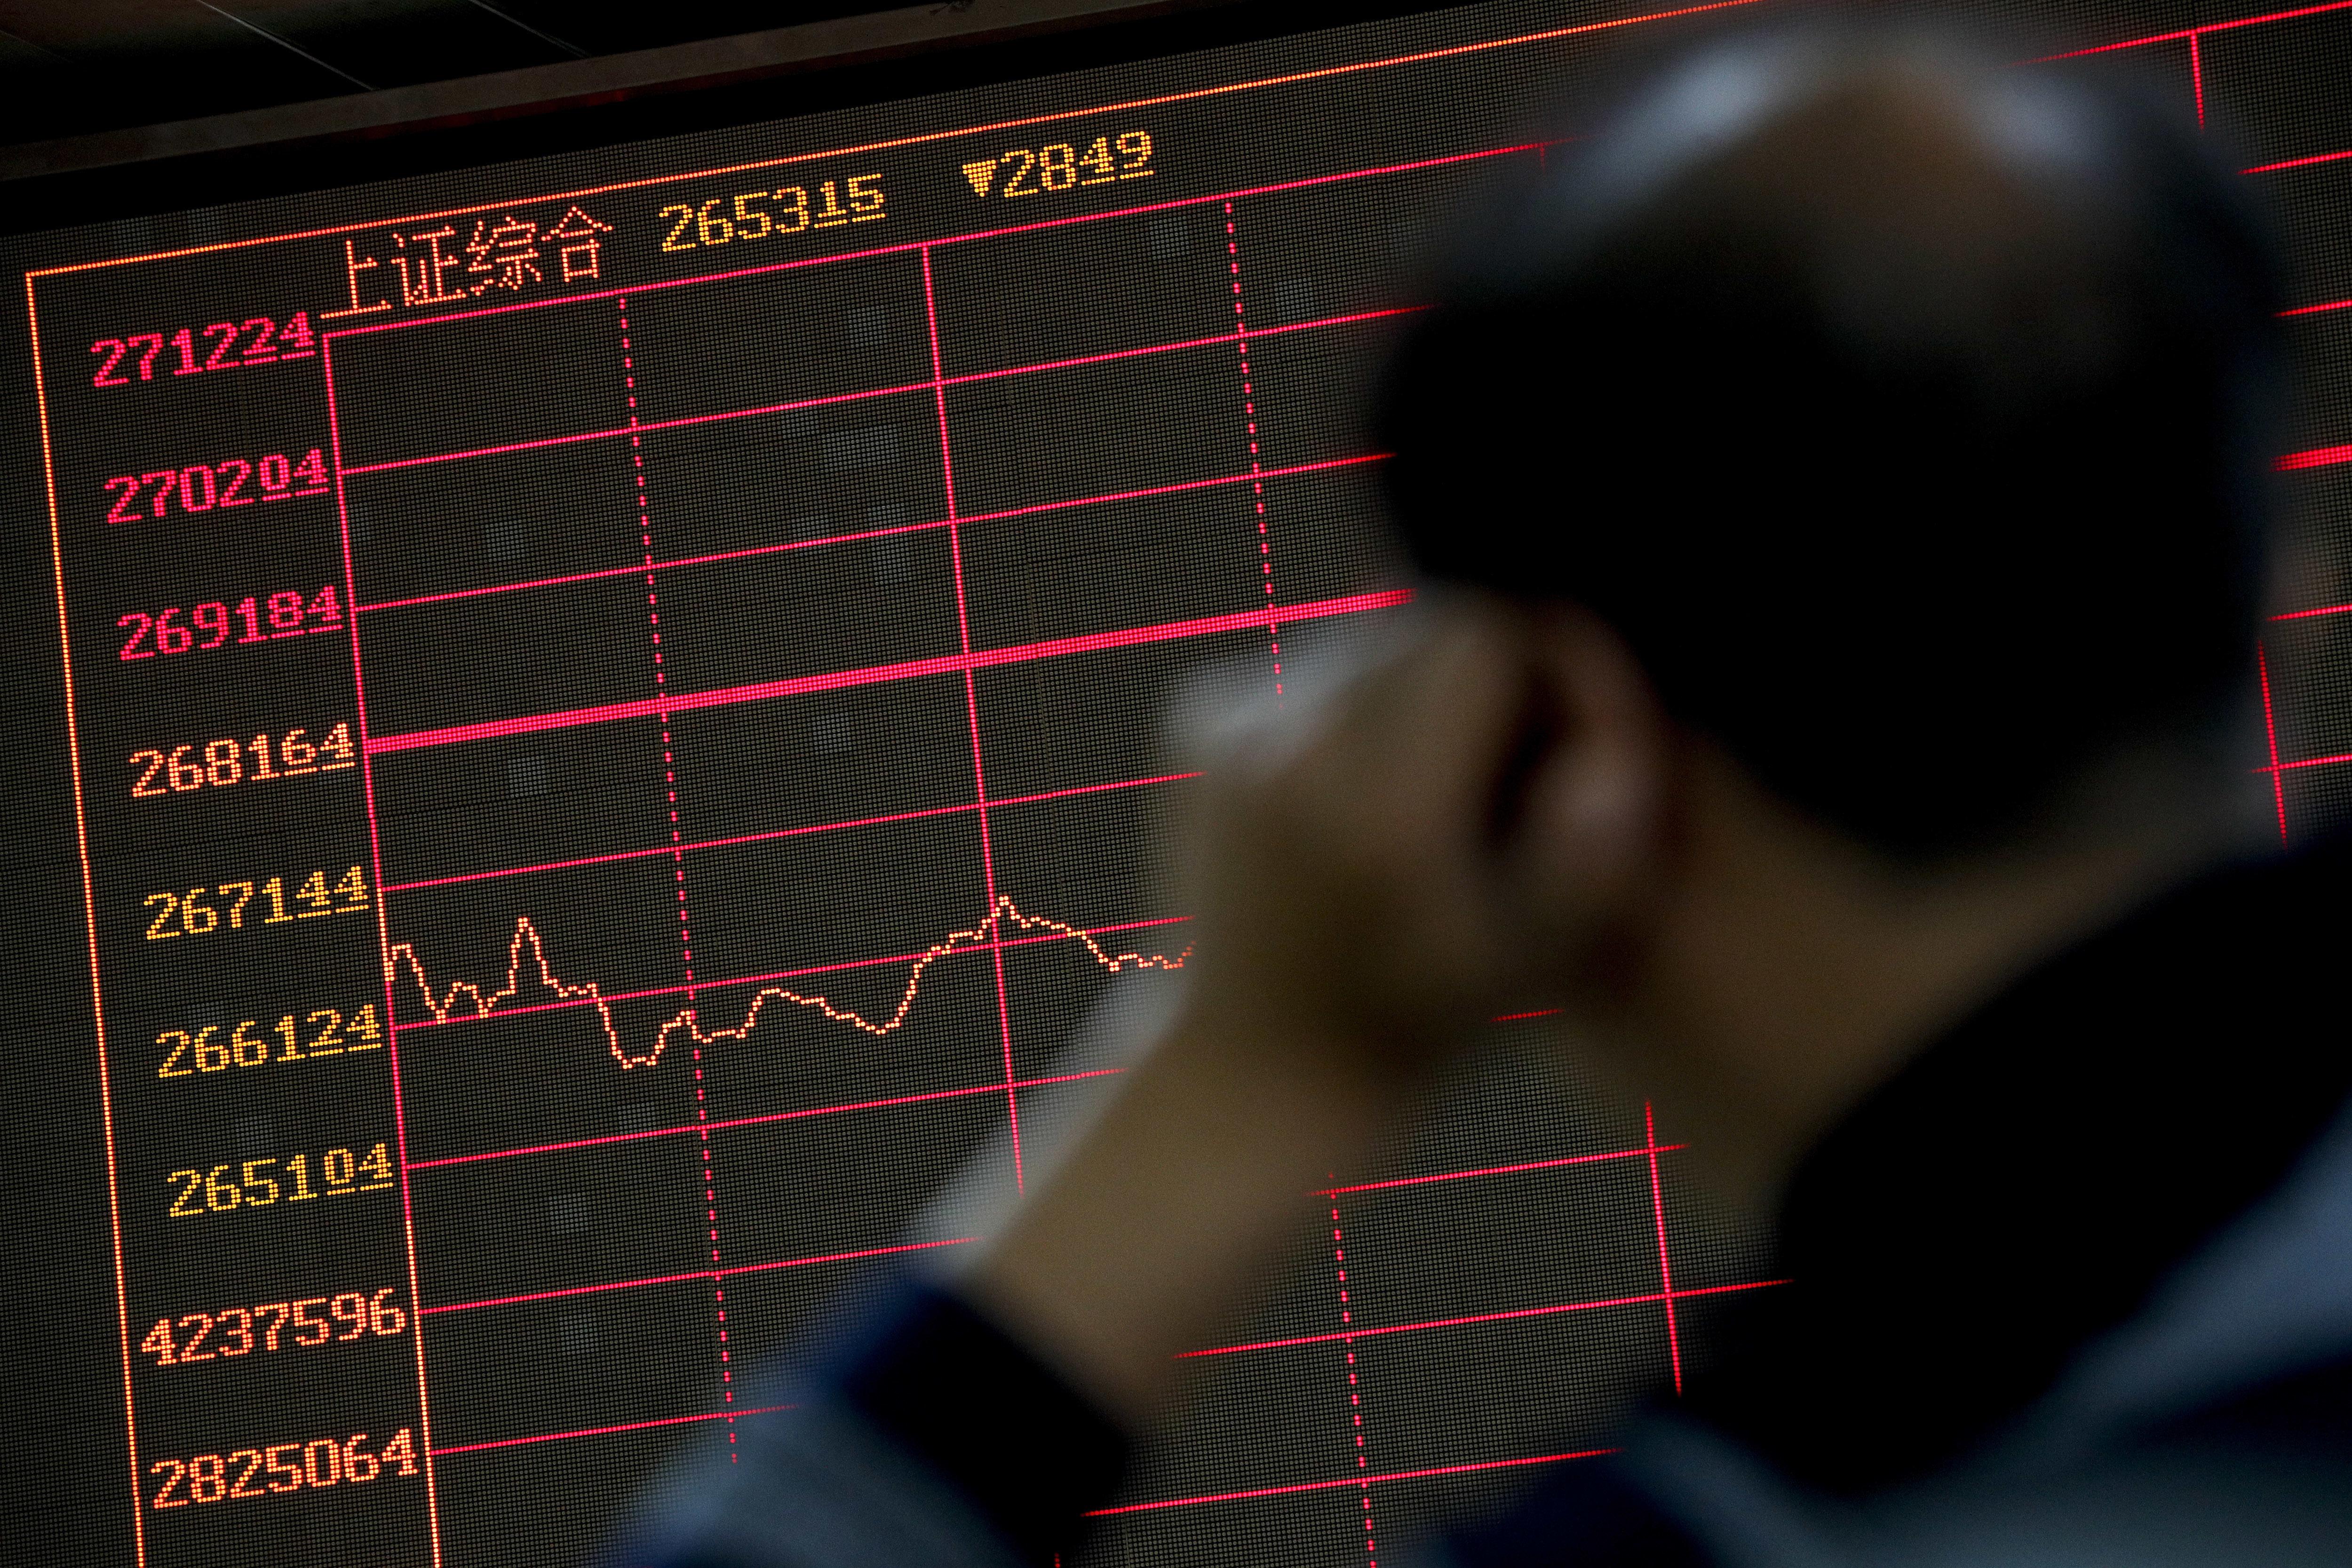 Trump announces new tariffs on $200 billion in Chinese goods